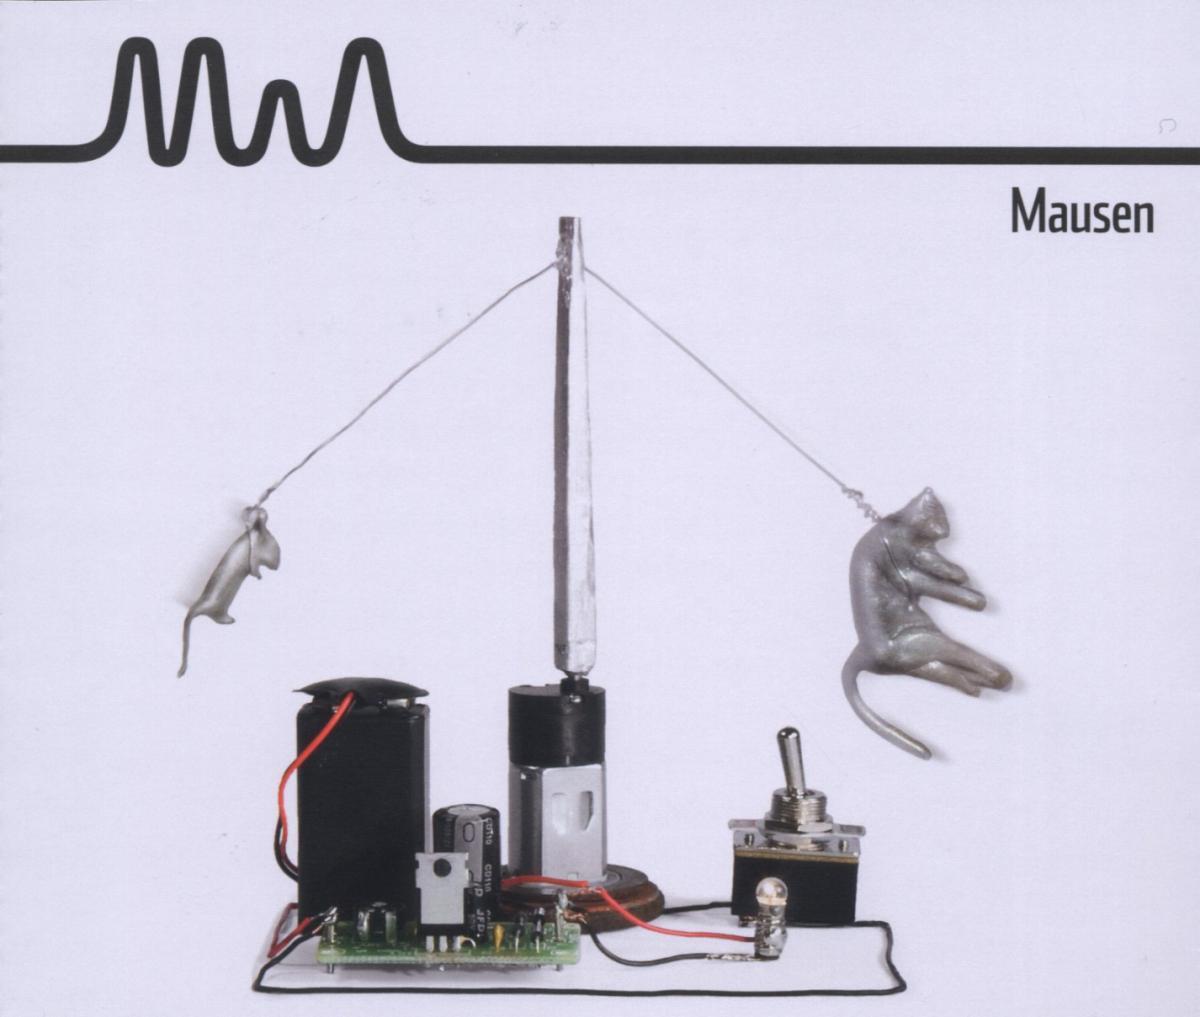 Mausen - Mia - Musik - COLUMBIA - 0886974012924 - 24/7-2015